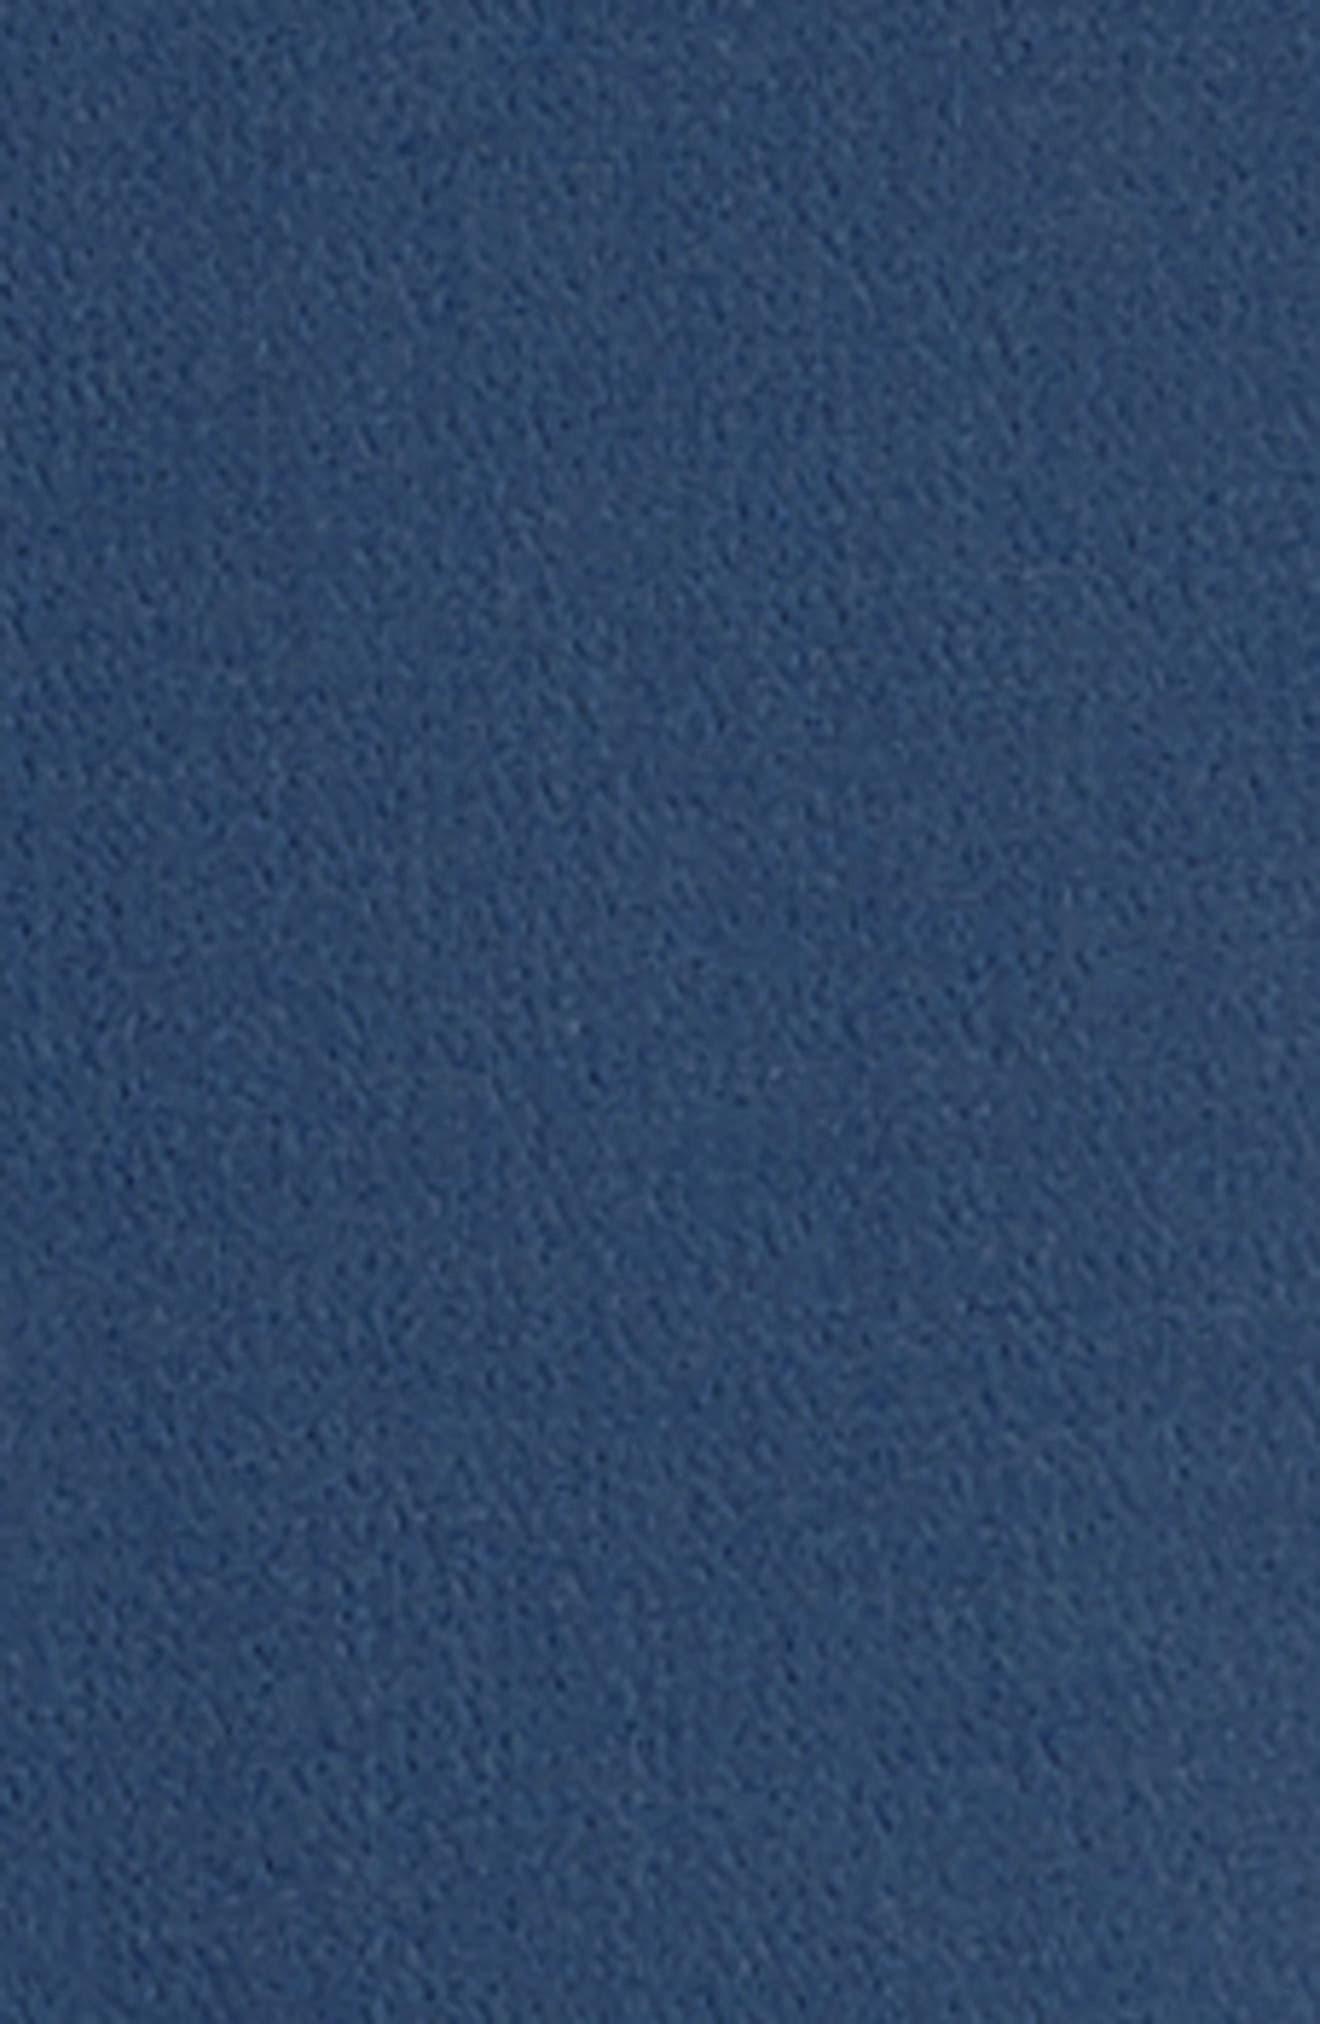 Double Face Wool Crepe Sheath Dress,                             Alternate thumbnail 6, color,                             478